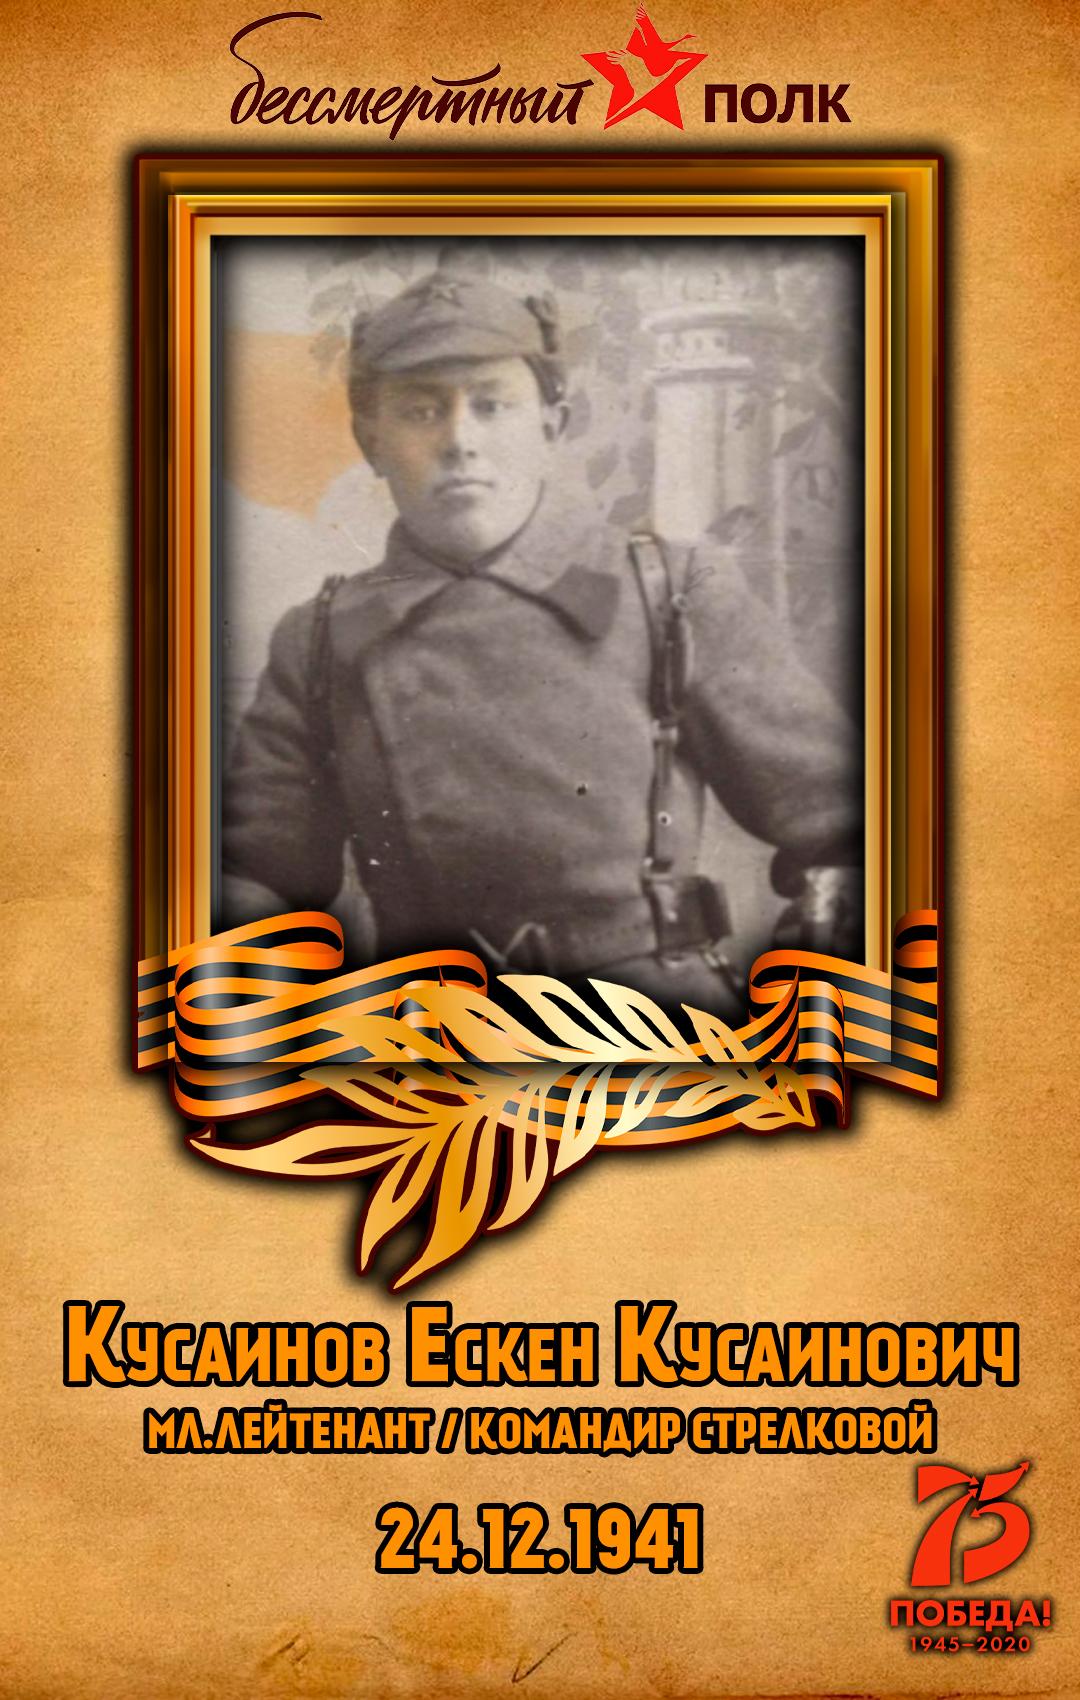 Кусаинов-Ескен-Кусаинович